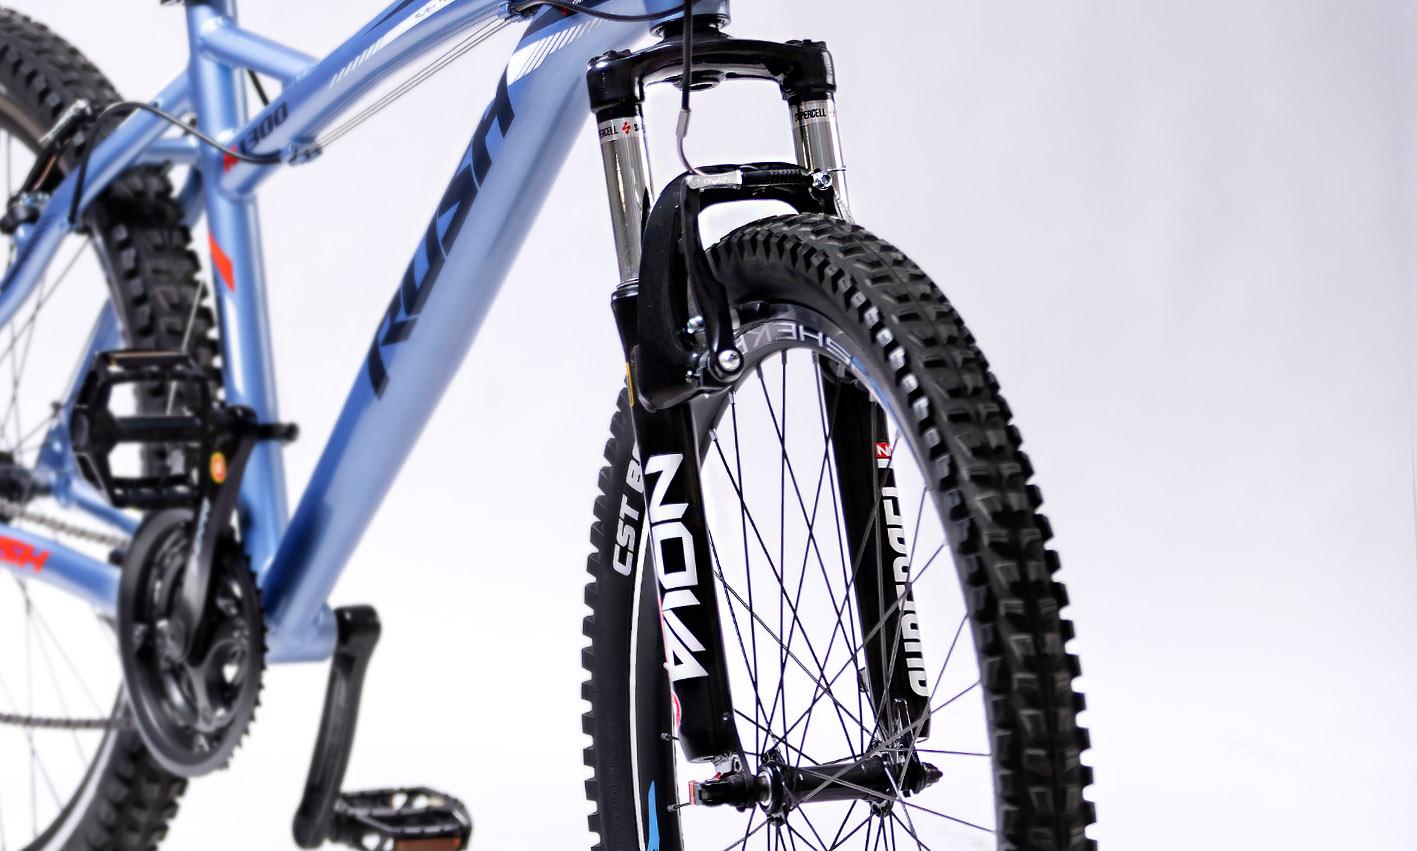 دوشاخ دوچرخه راش